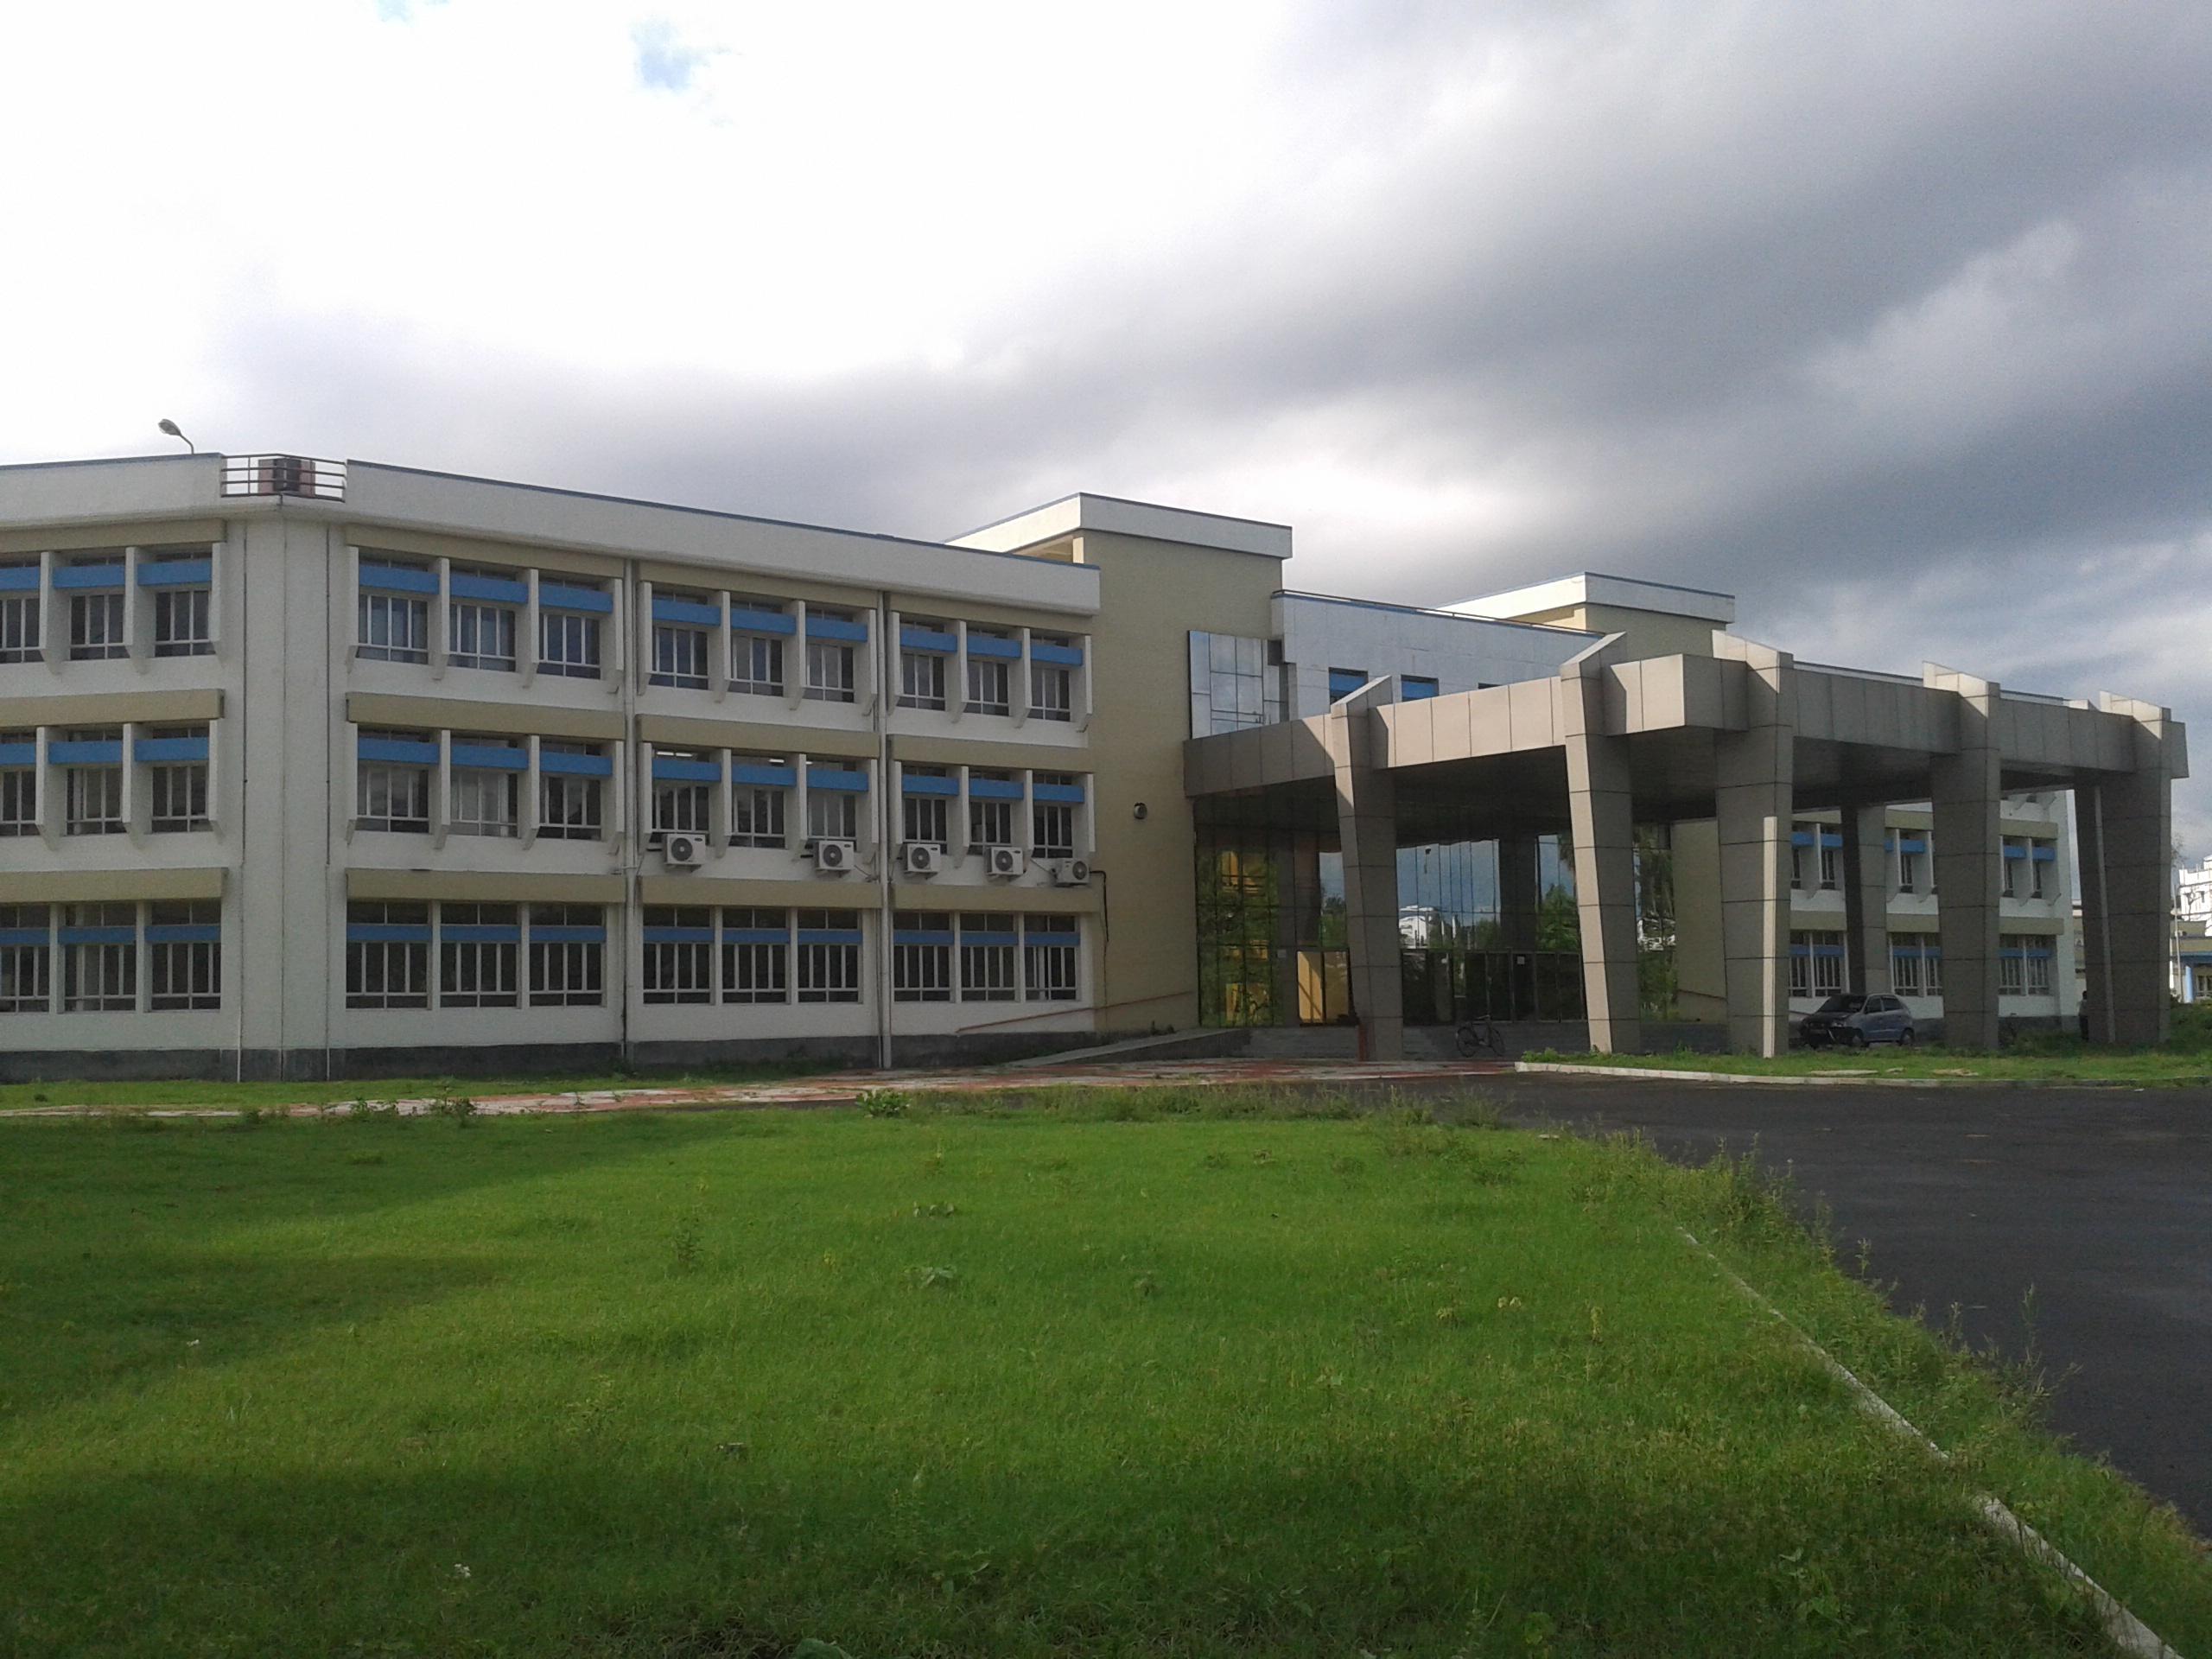 University College Of Nursing College Of Medicine and Jnm Hospital Image